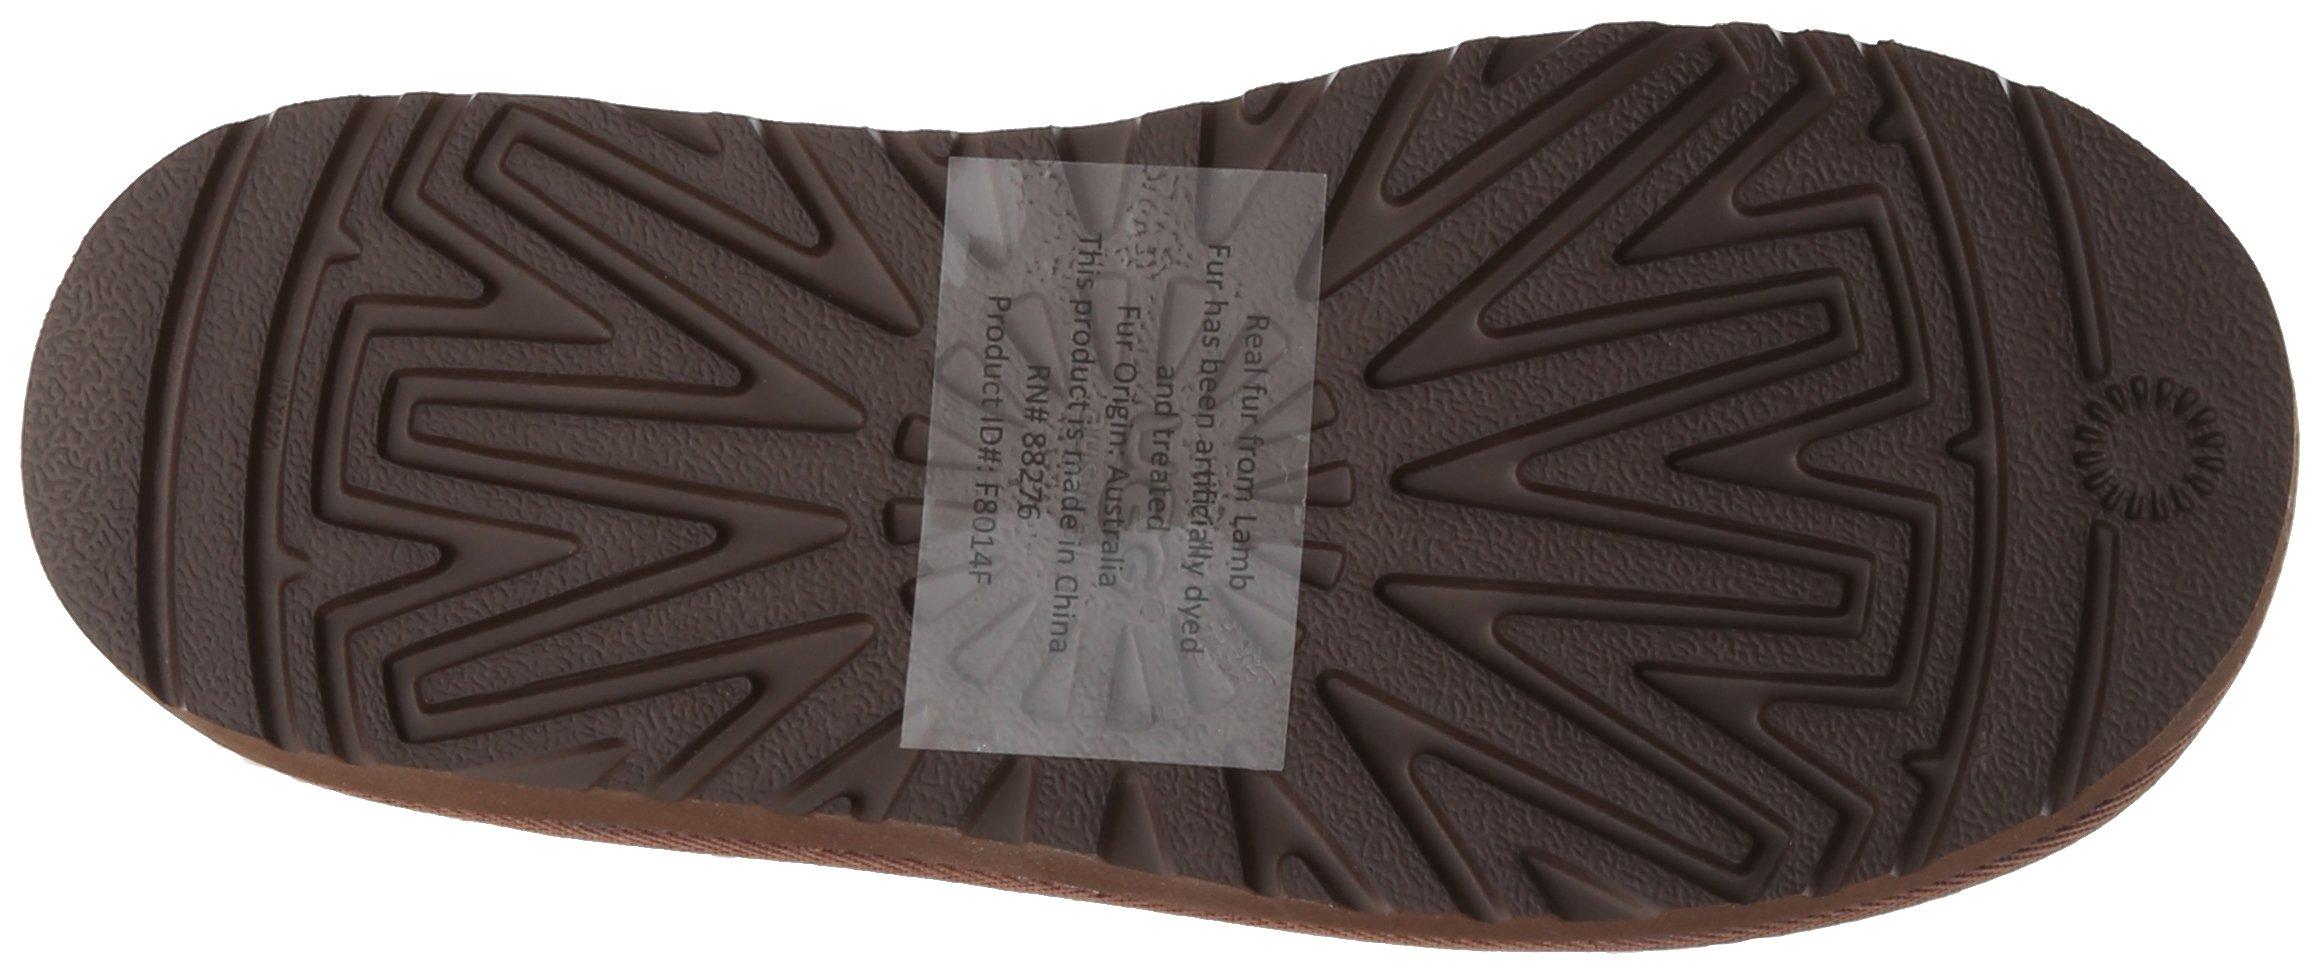 UGG Australia Girls Maddi Chocolate Western Boot - 5 by UGG (Image #3)